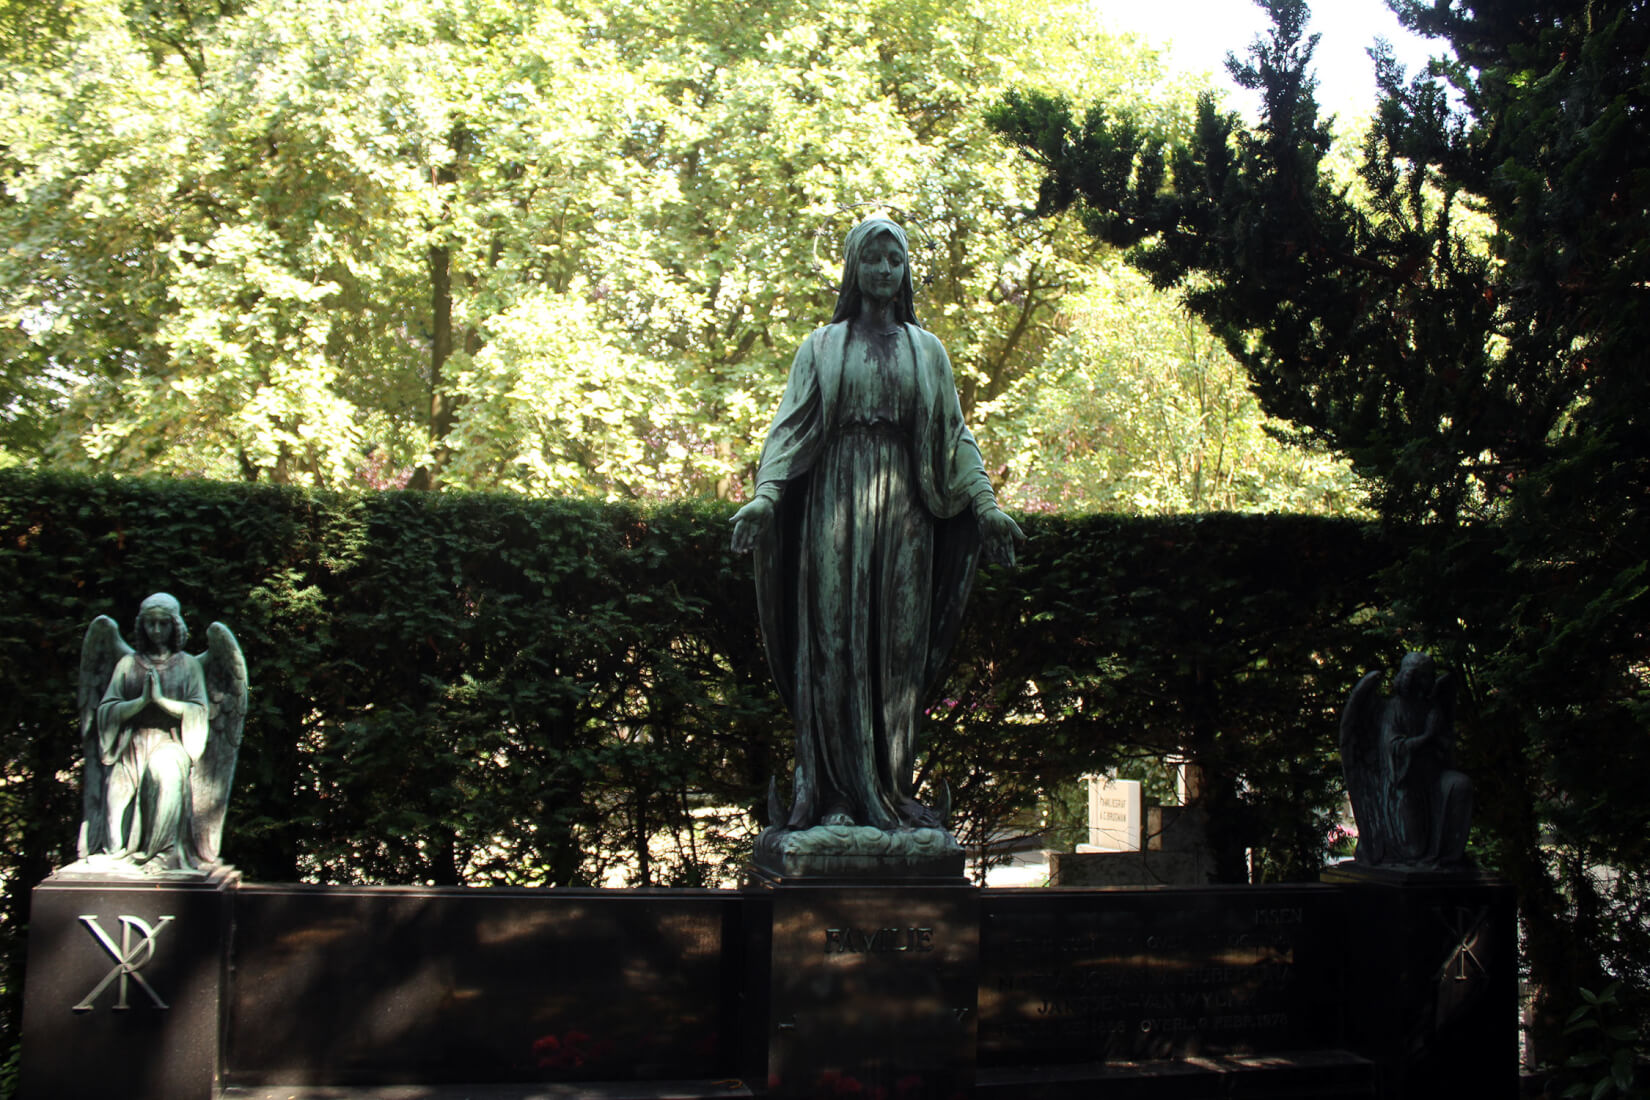 Beeld van engel op begraafplaats Amsterdam